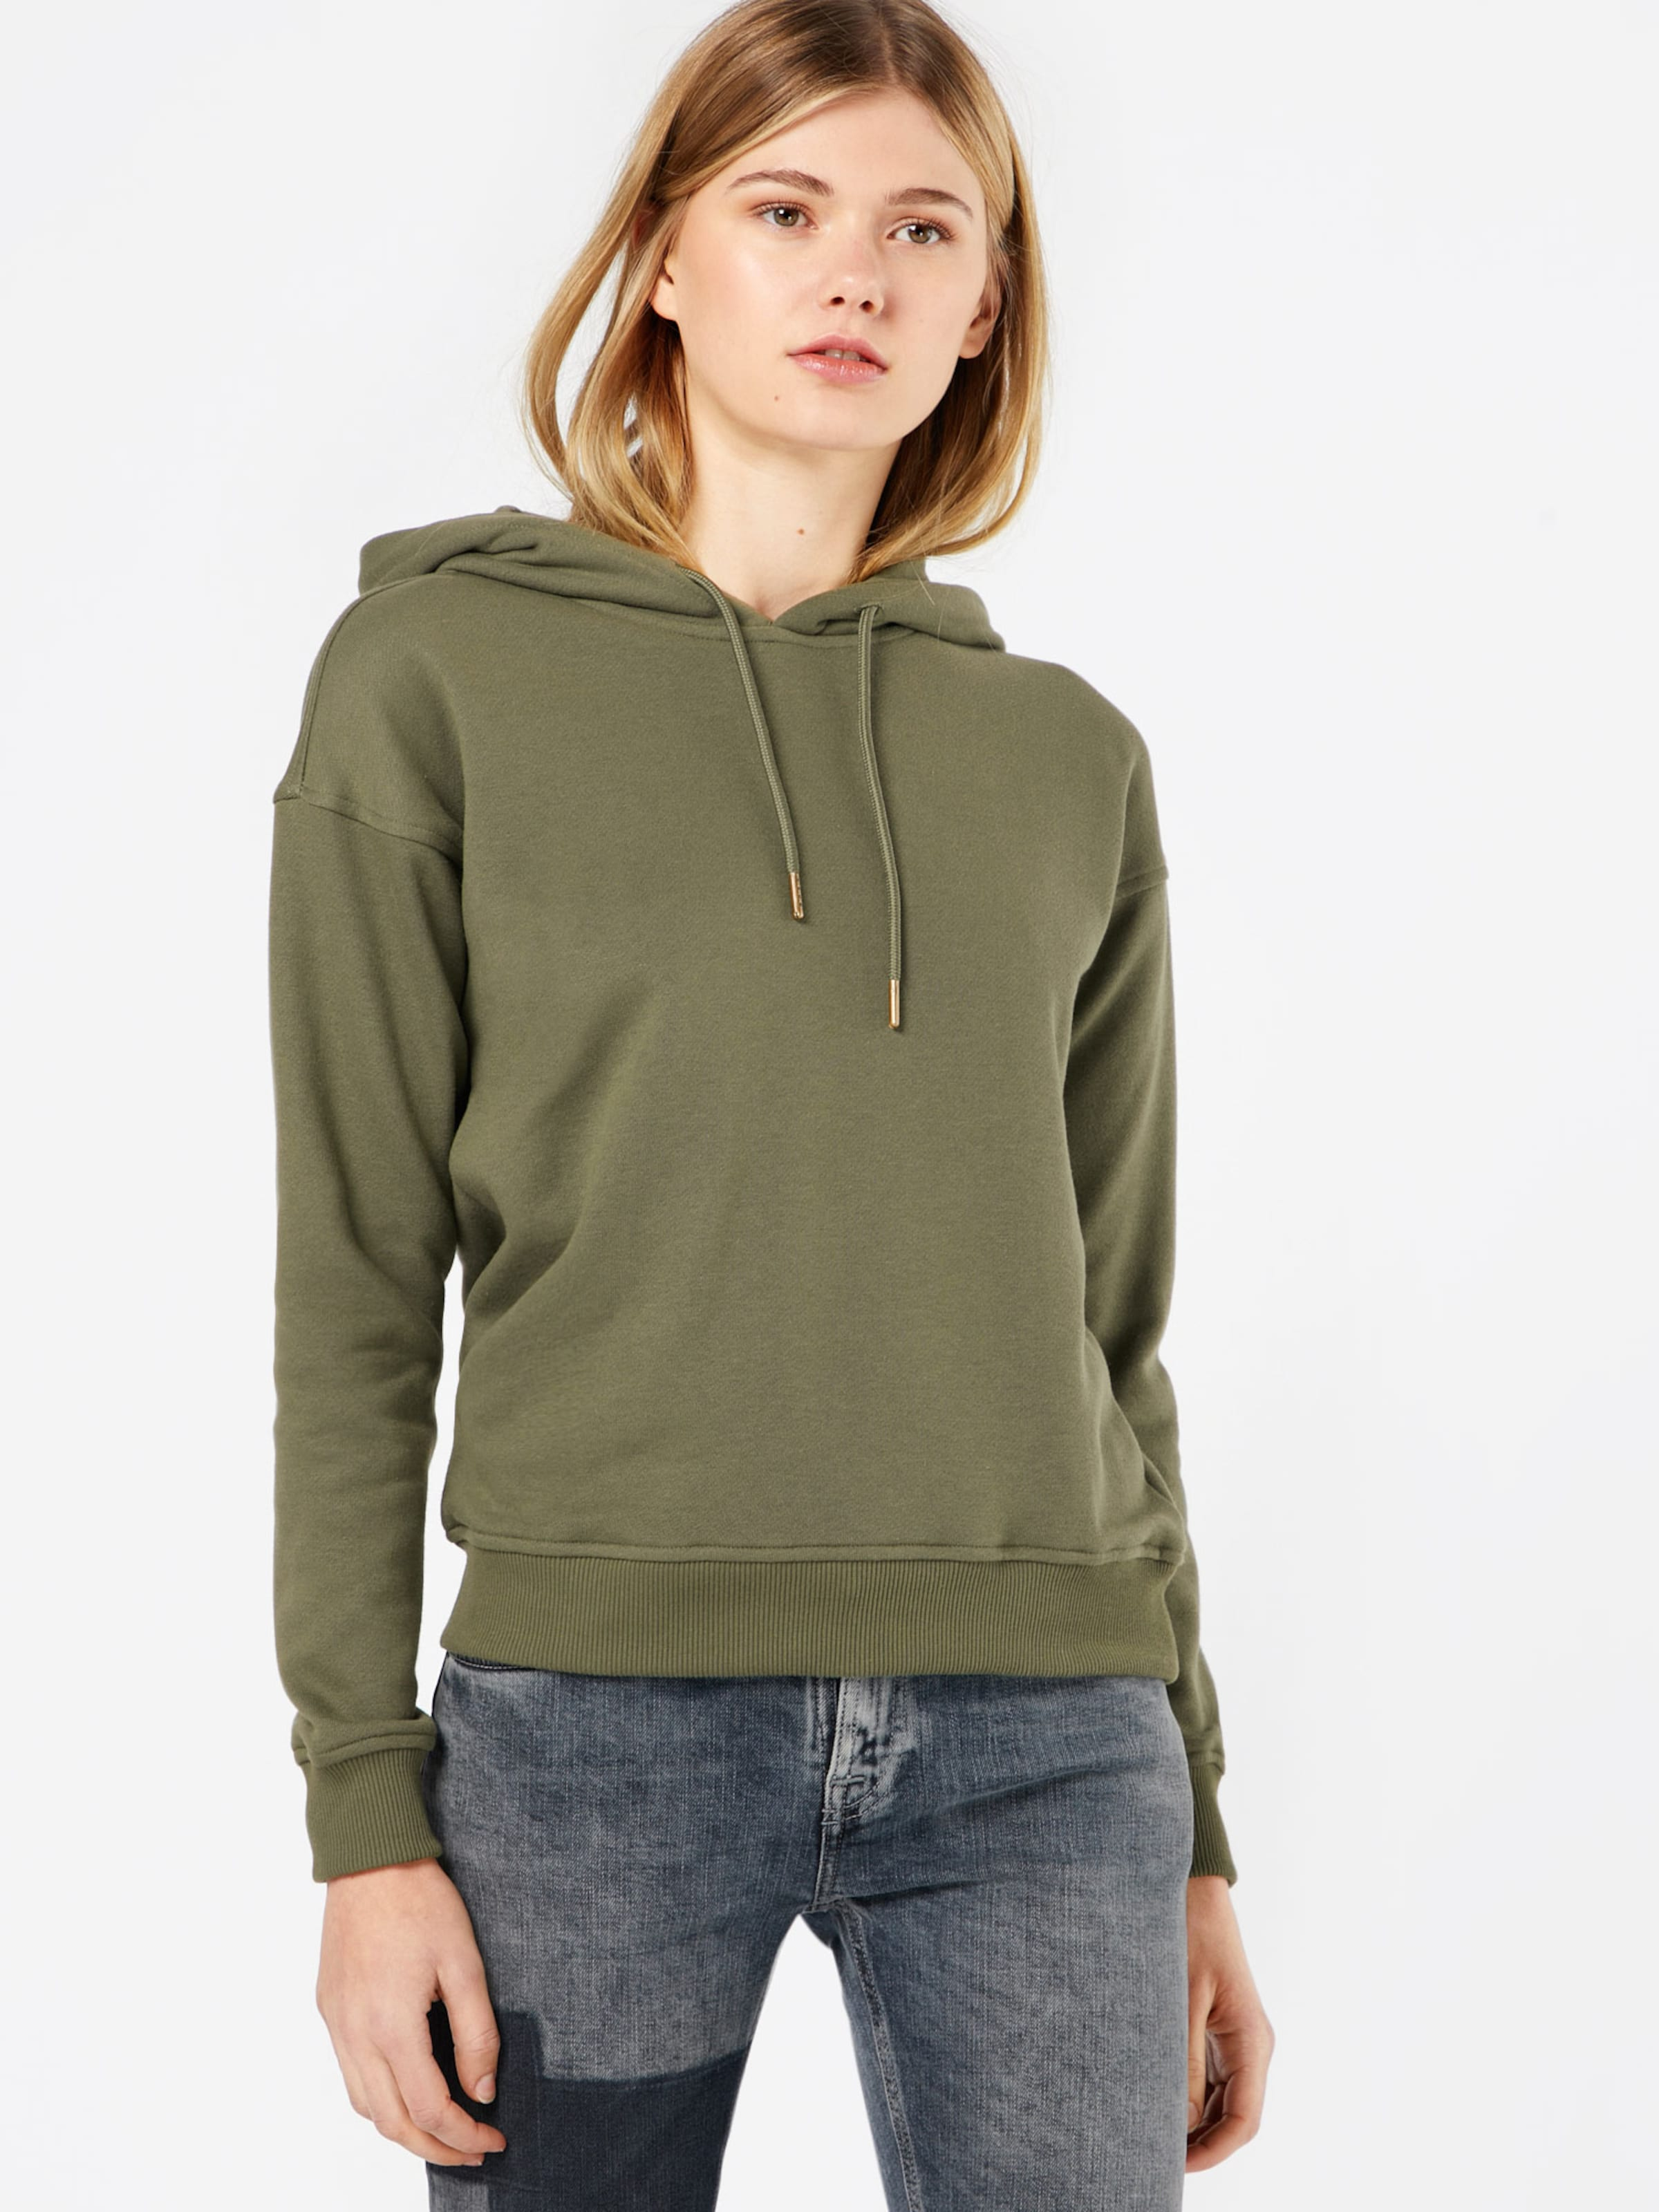 Urban In Oliv Classics Sweatshirt Urban Classics 7Yyf6gvb